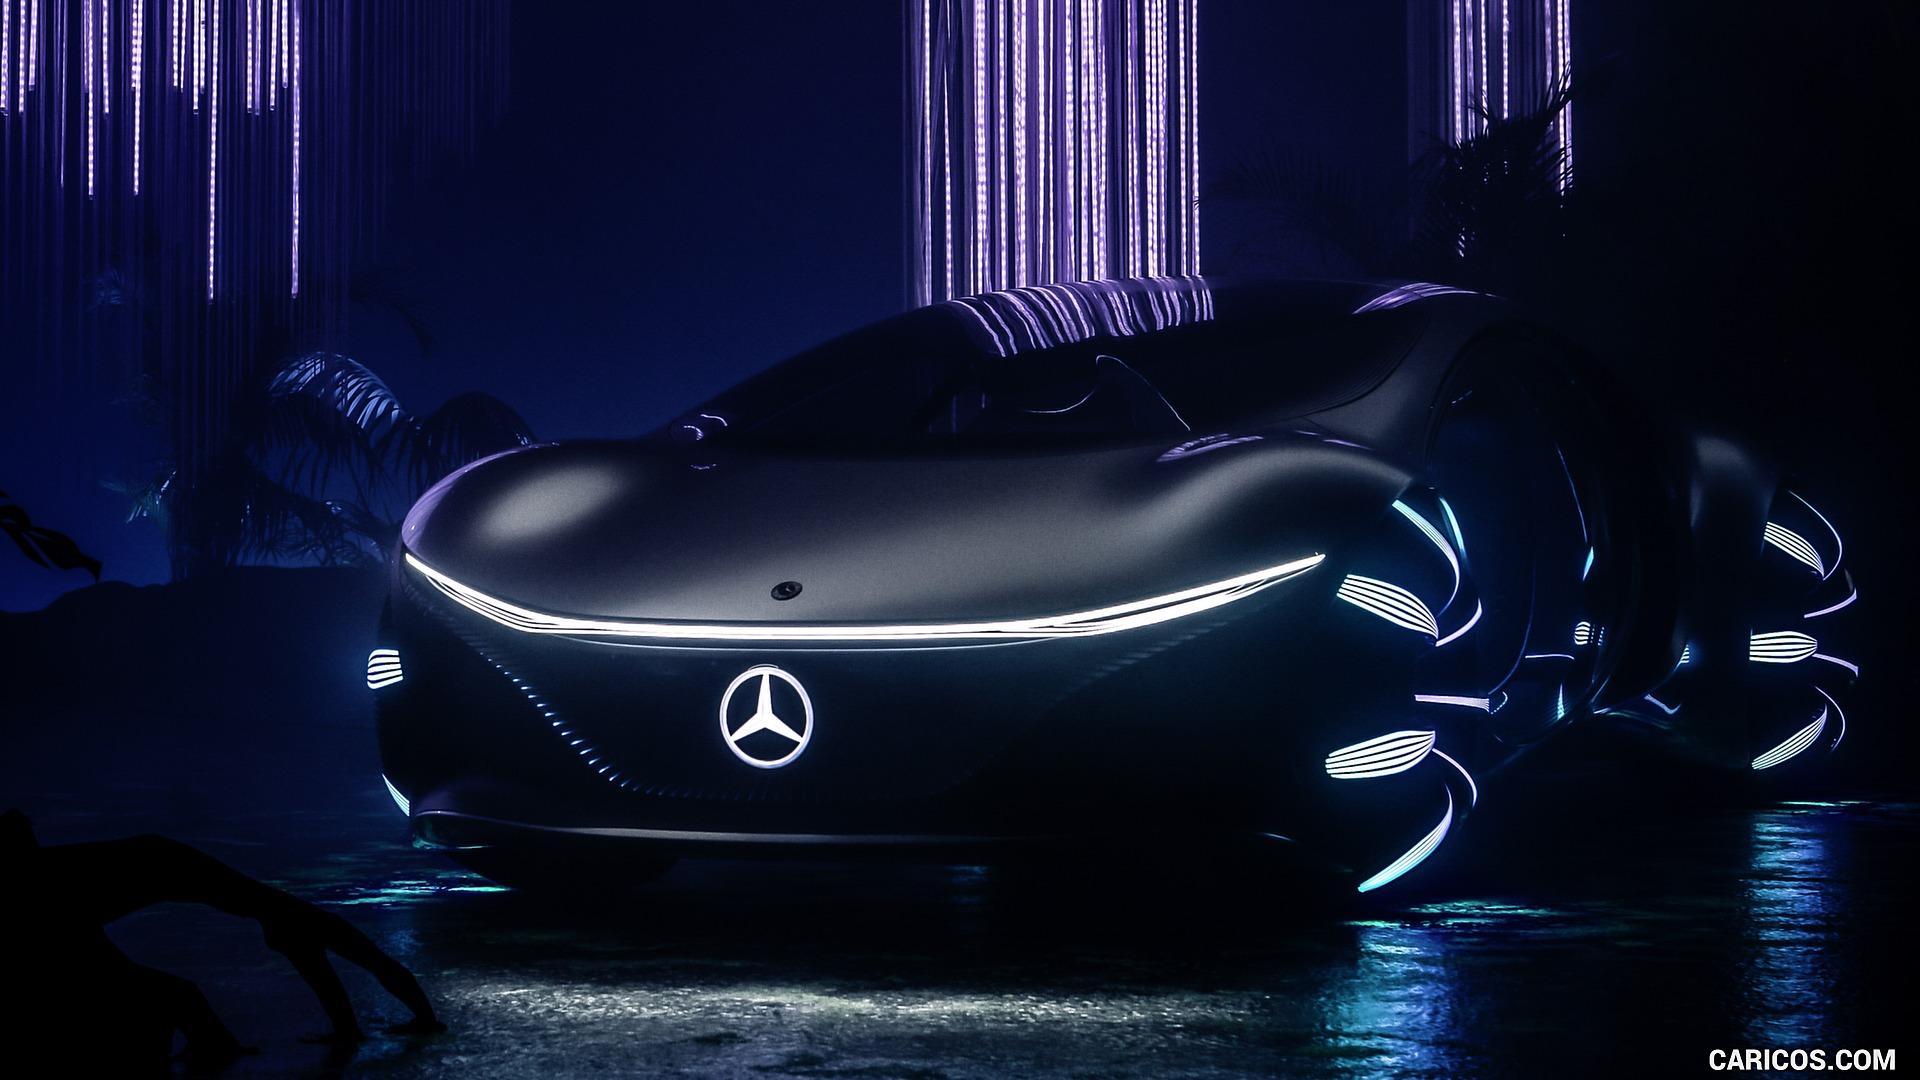 2020 Mercedes Benz VISION AVTR Concept   Front HD Wallpaper 14 1920x1080